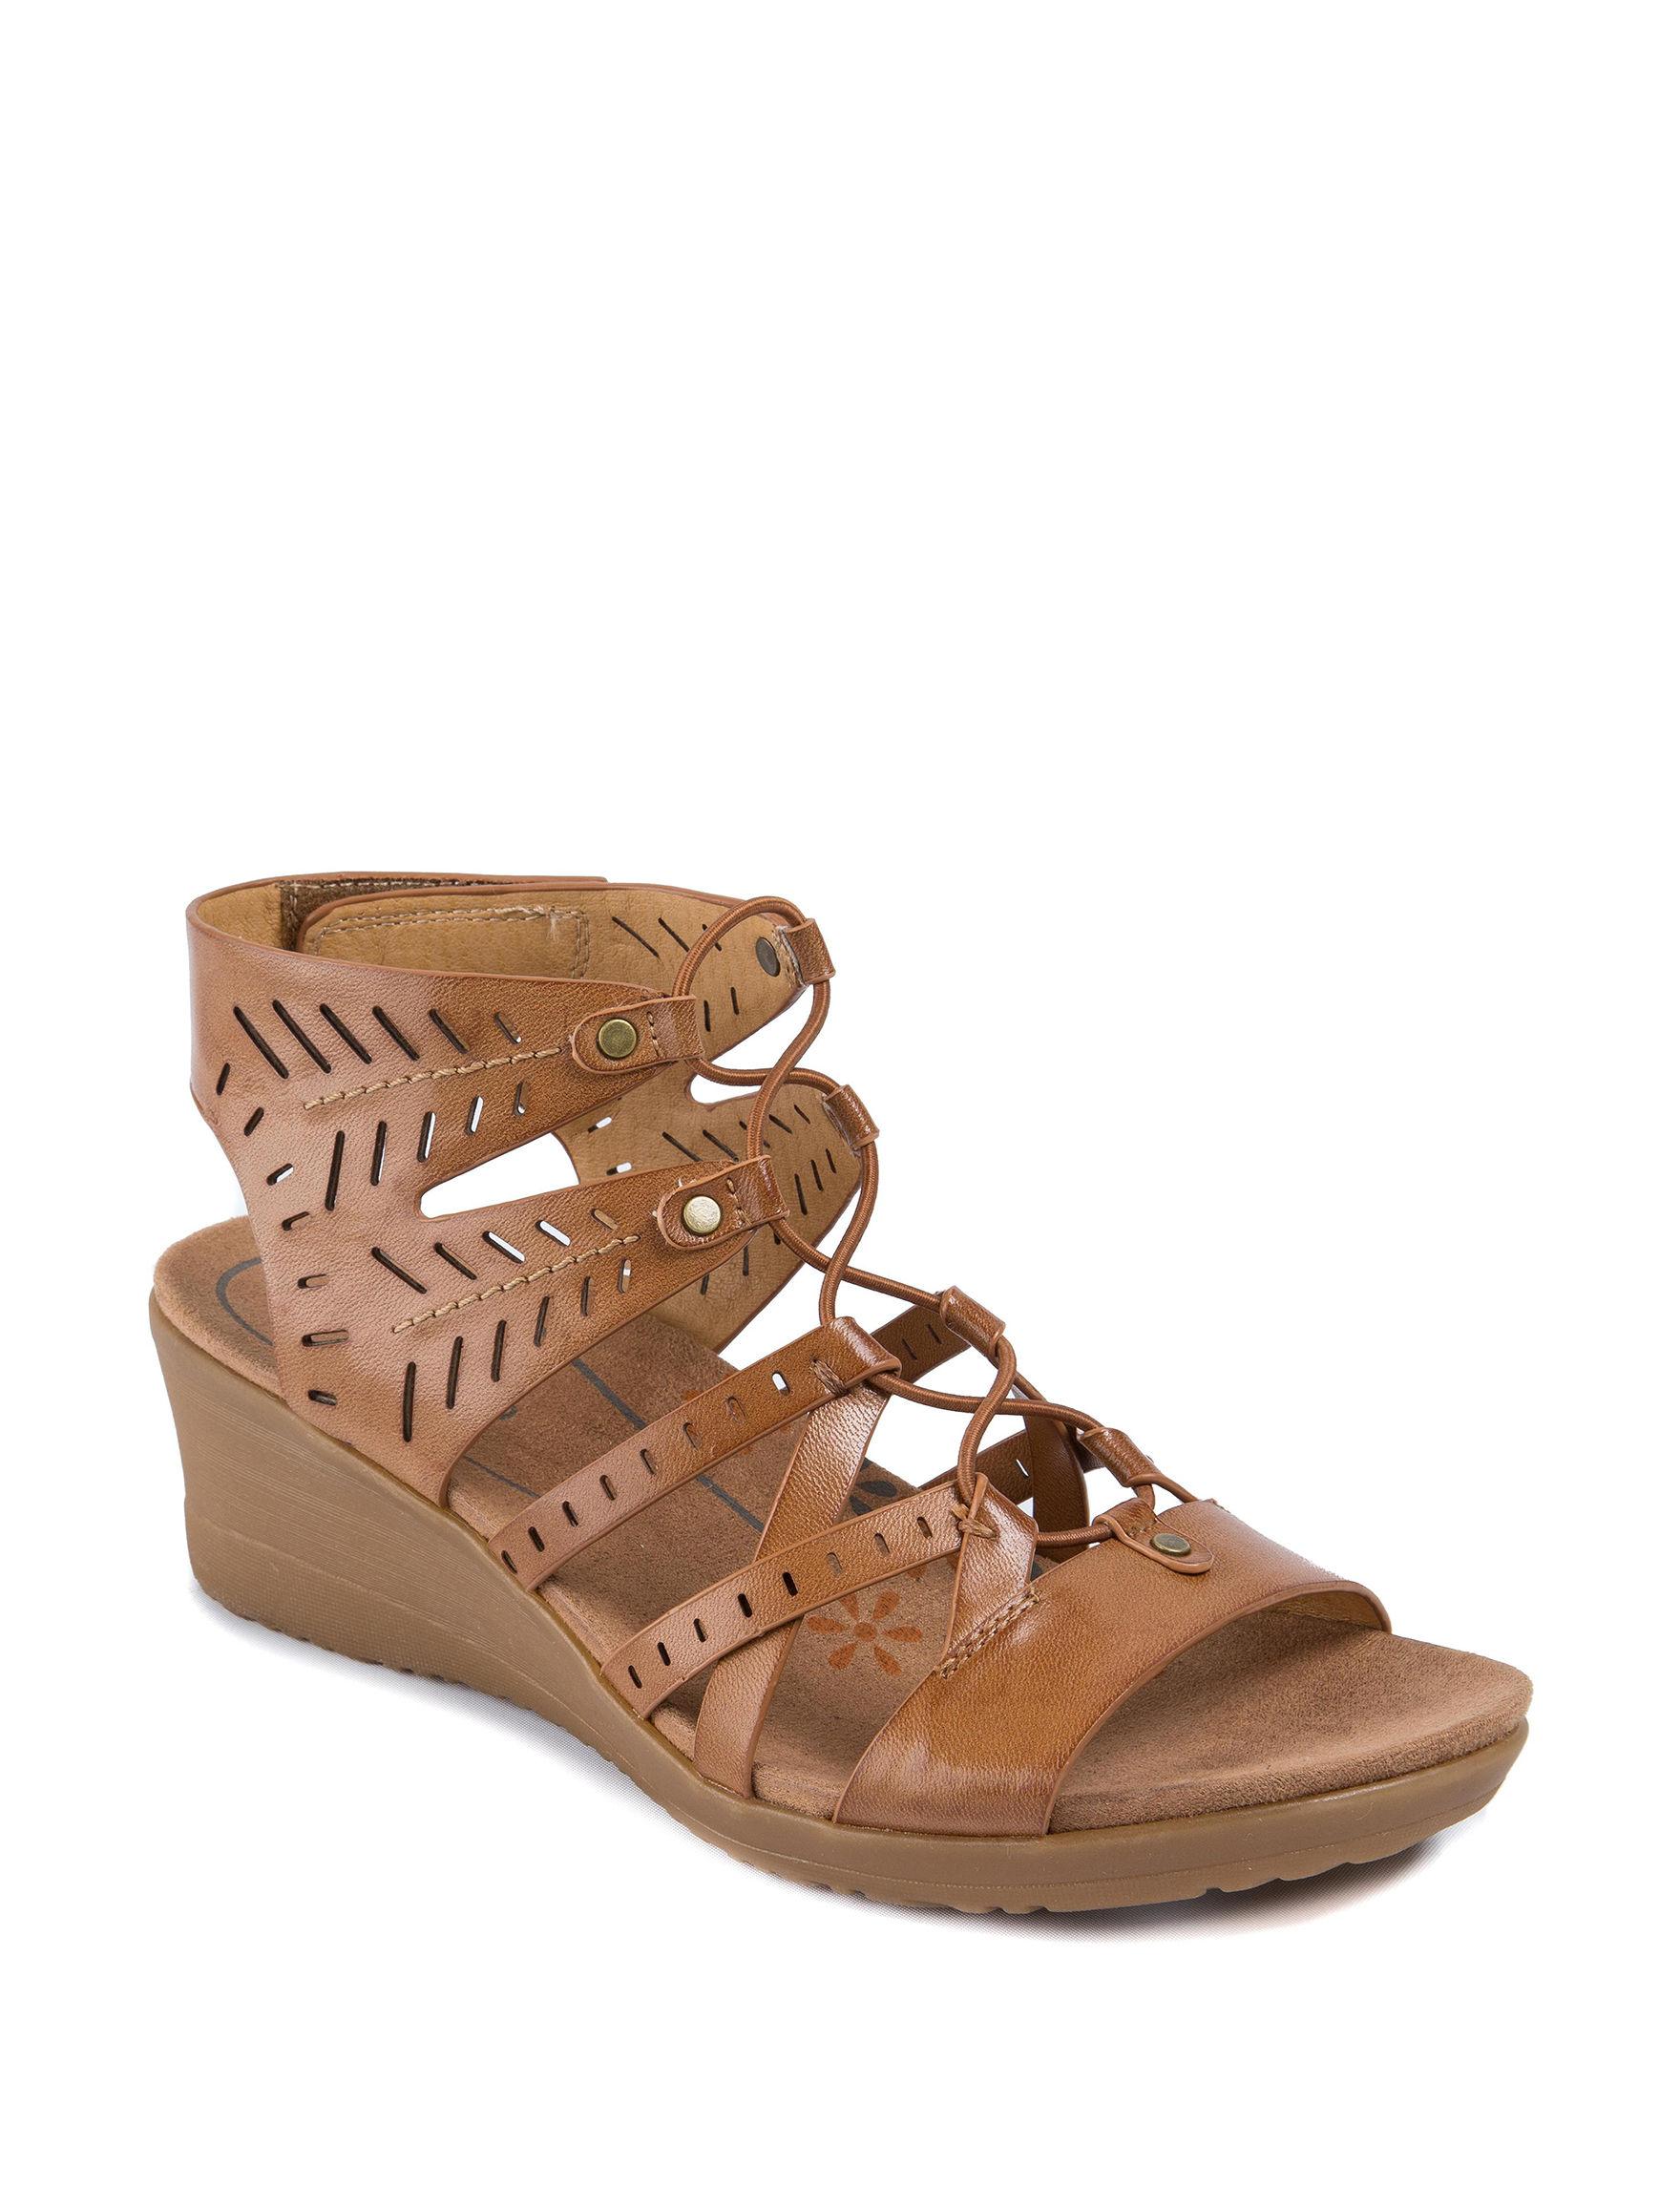 Baretraps Brown Wedge Sandals